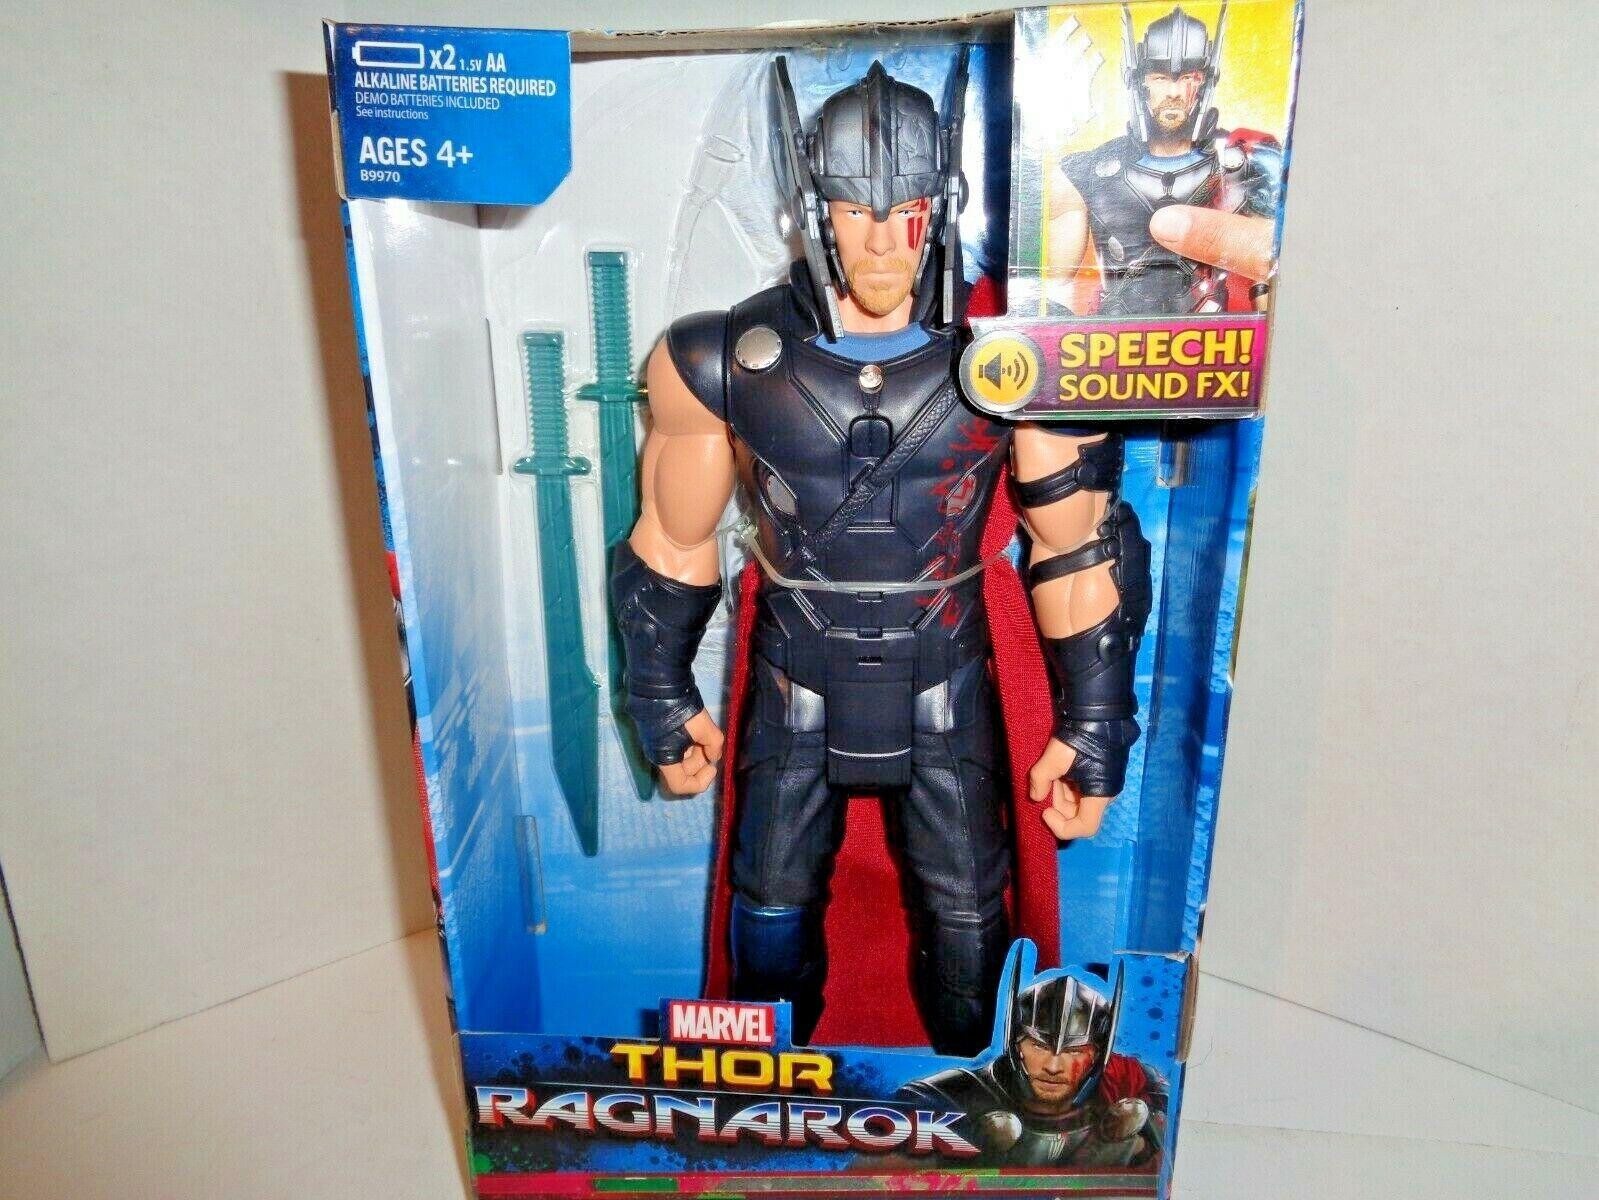 Thor Ragnarok Speech Sound FX Interactive Electronic Thor